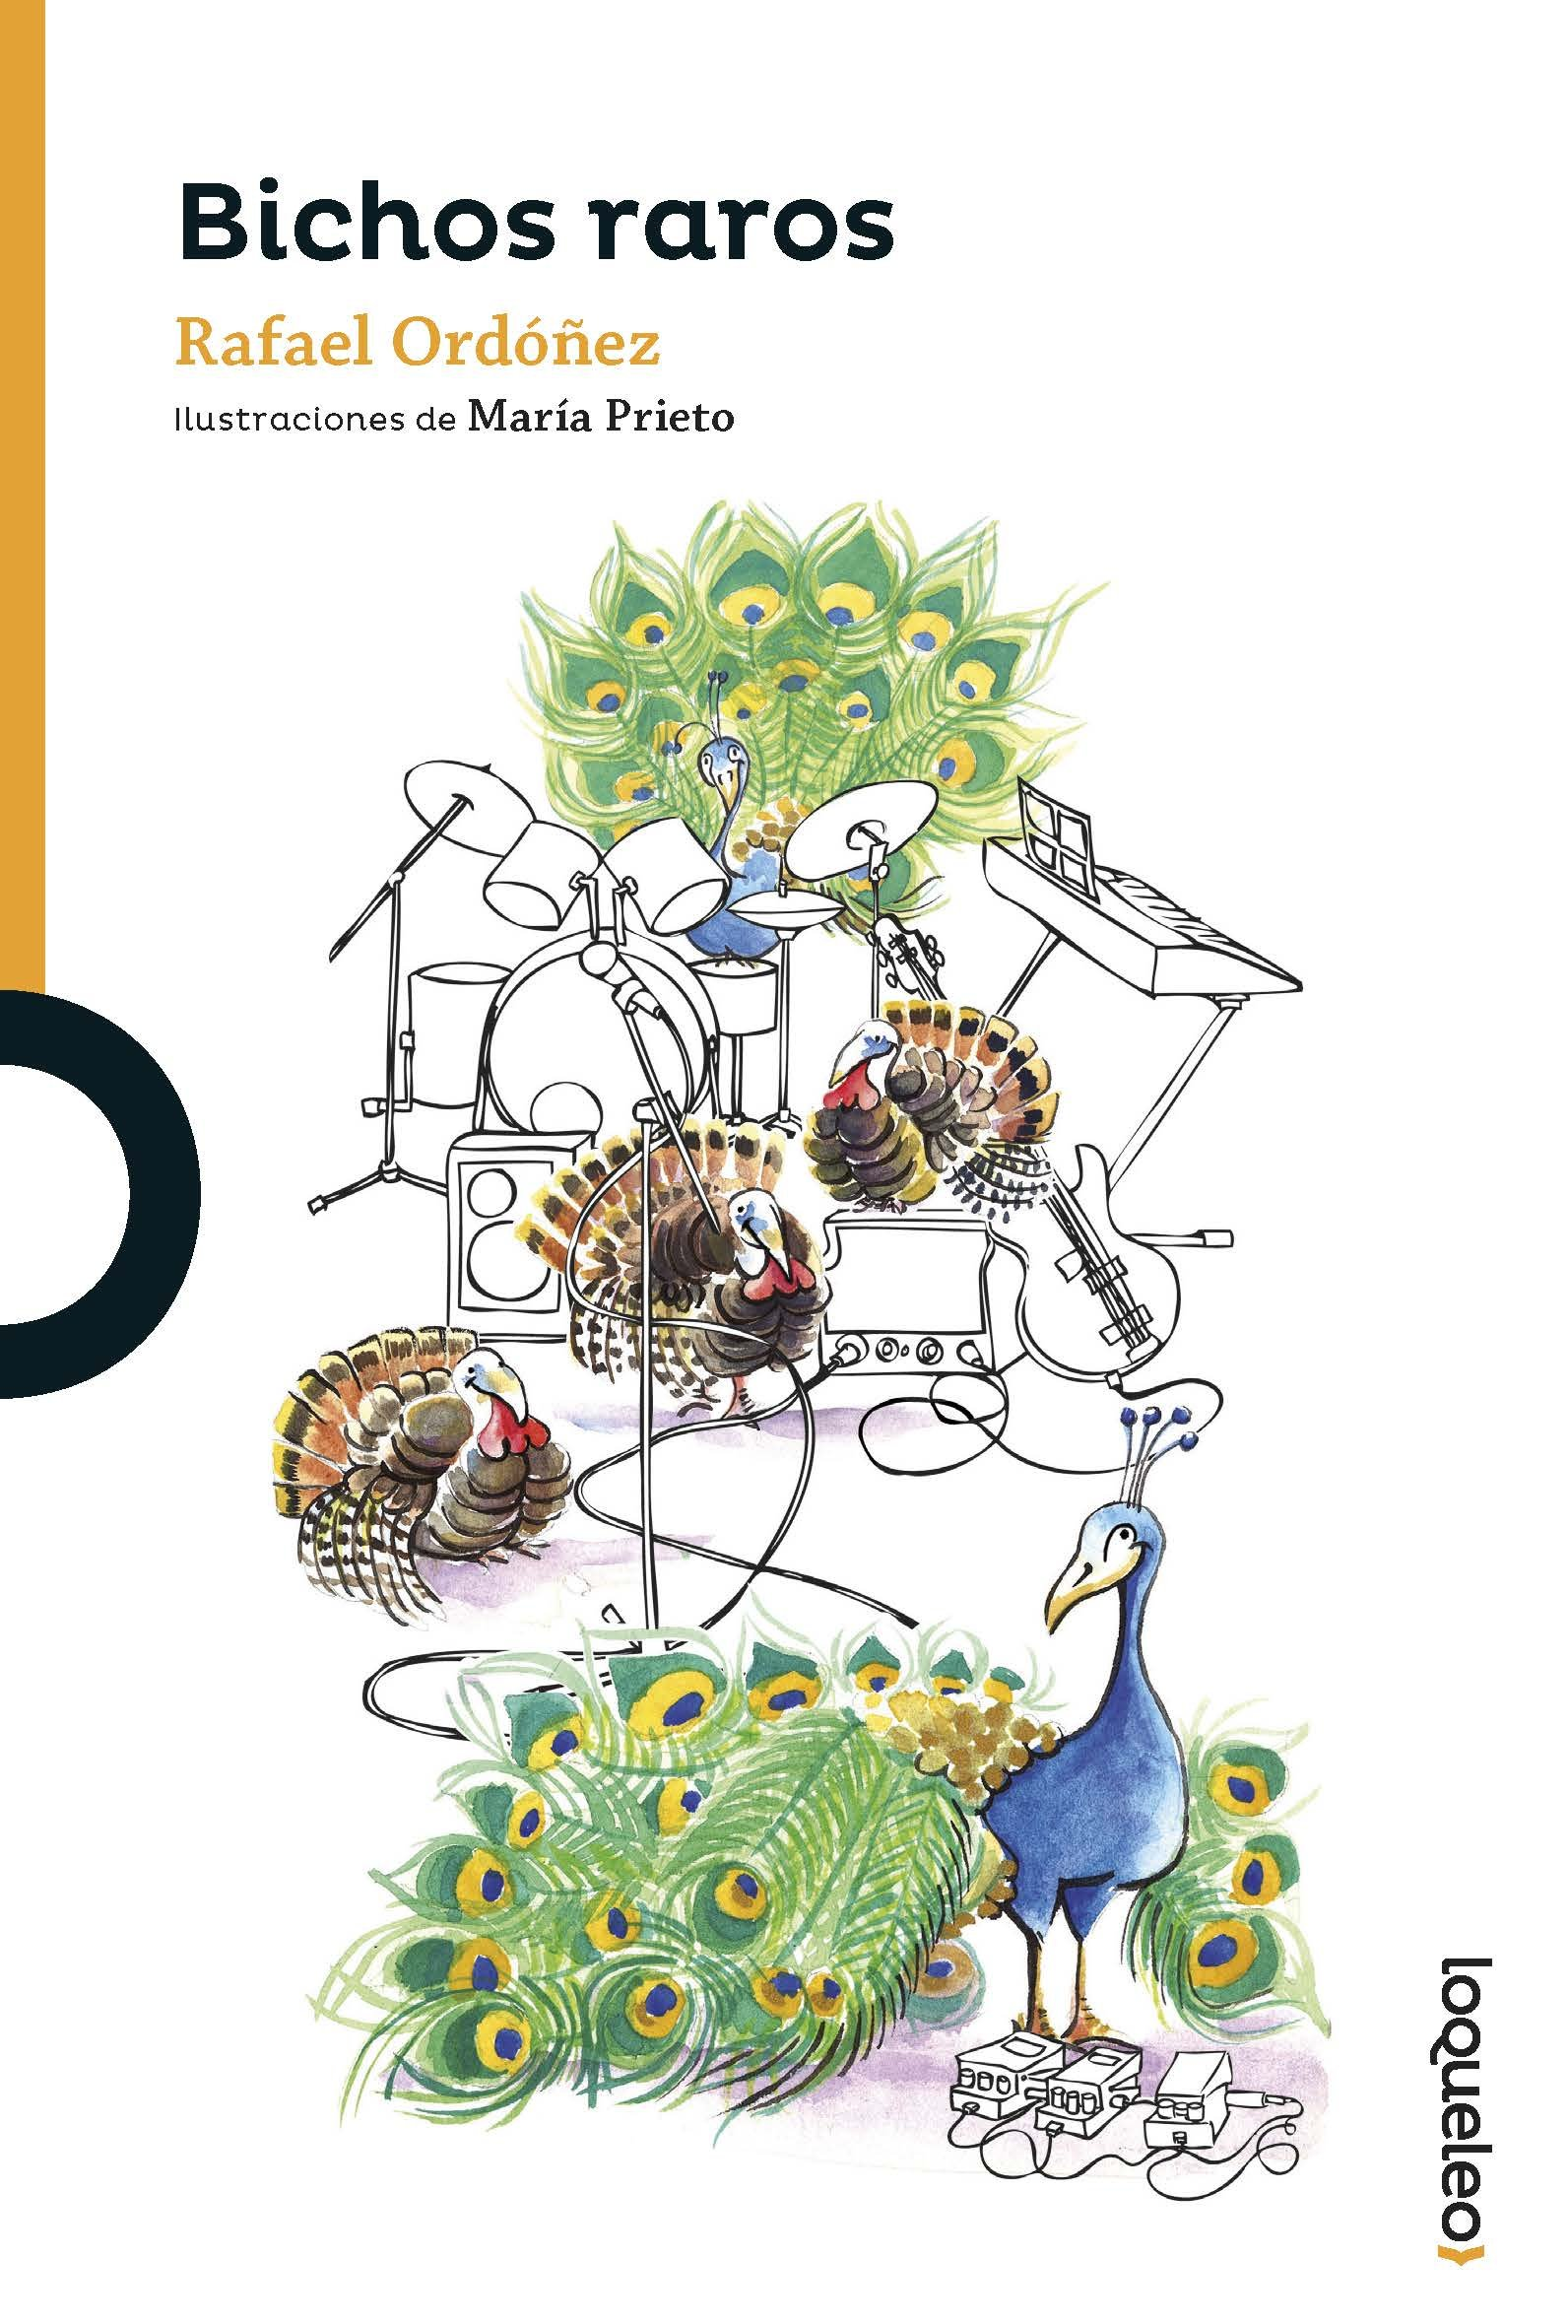 Bichos raros: Amazon.es: Cuadrado Ordóñez, Rafael, Prieto Fernande-Yañez, Maria: Libros